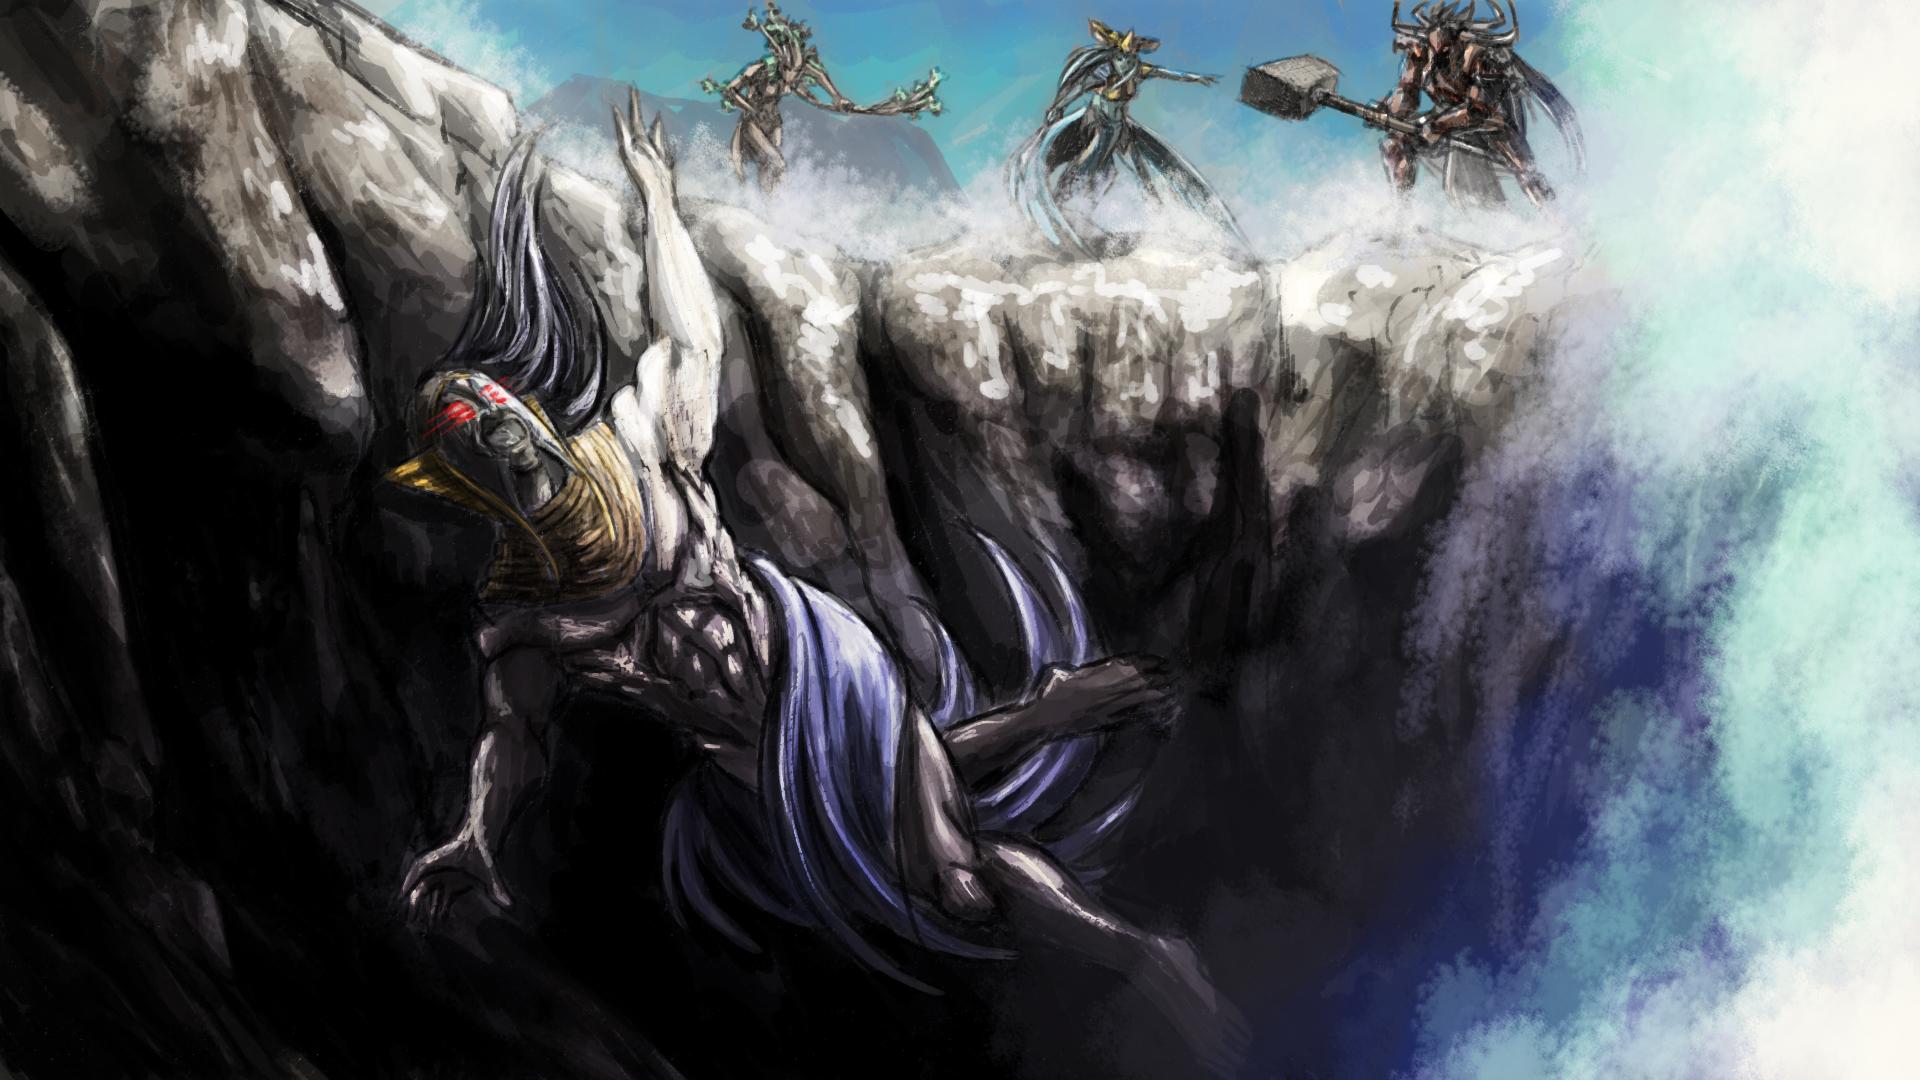 abaddon guild wars wallpaper -#main